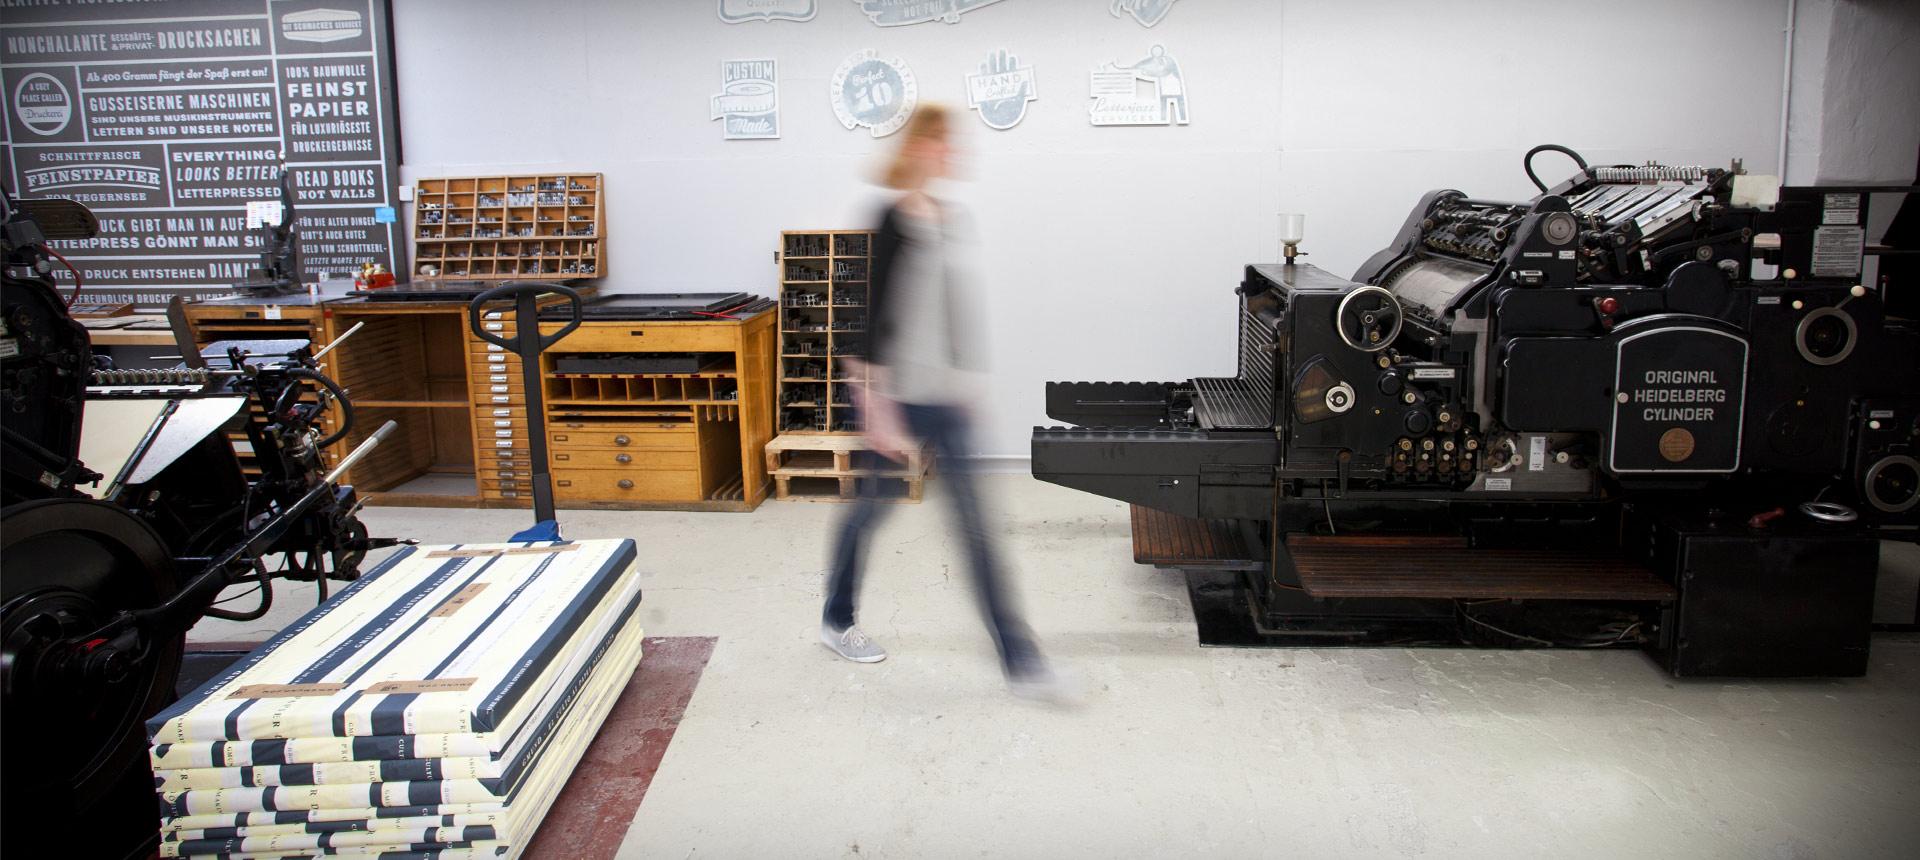 Letterpress: Studio